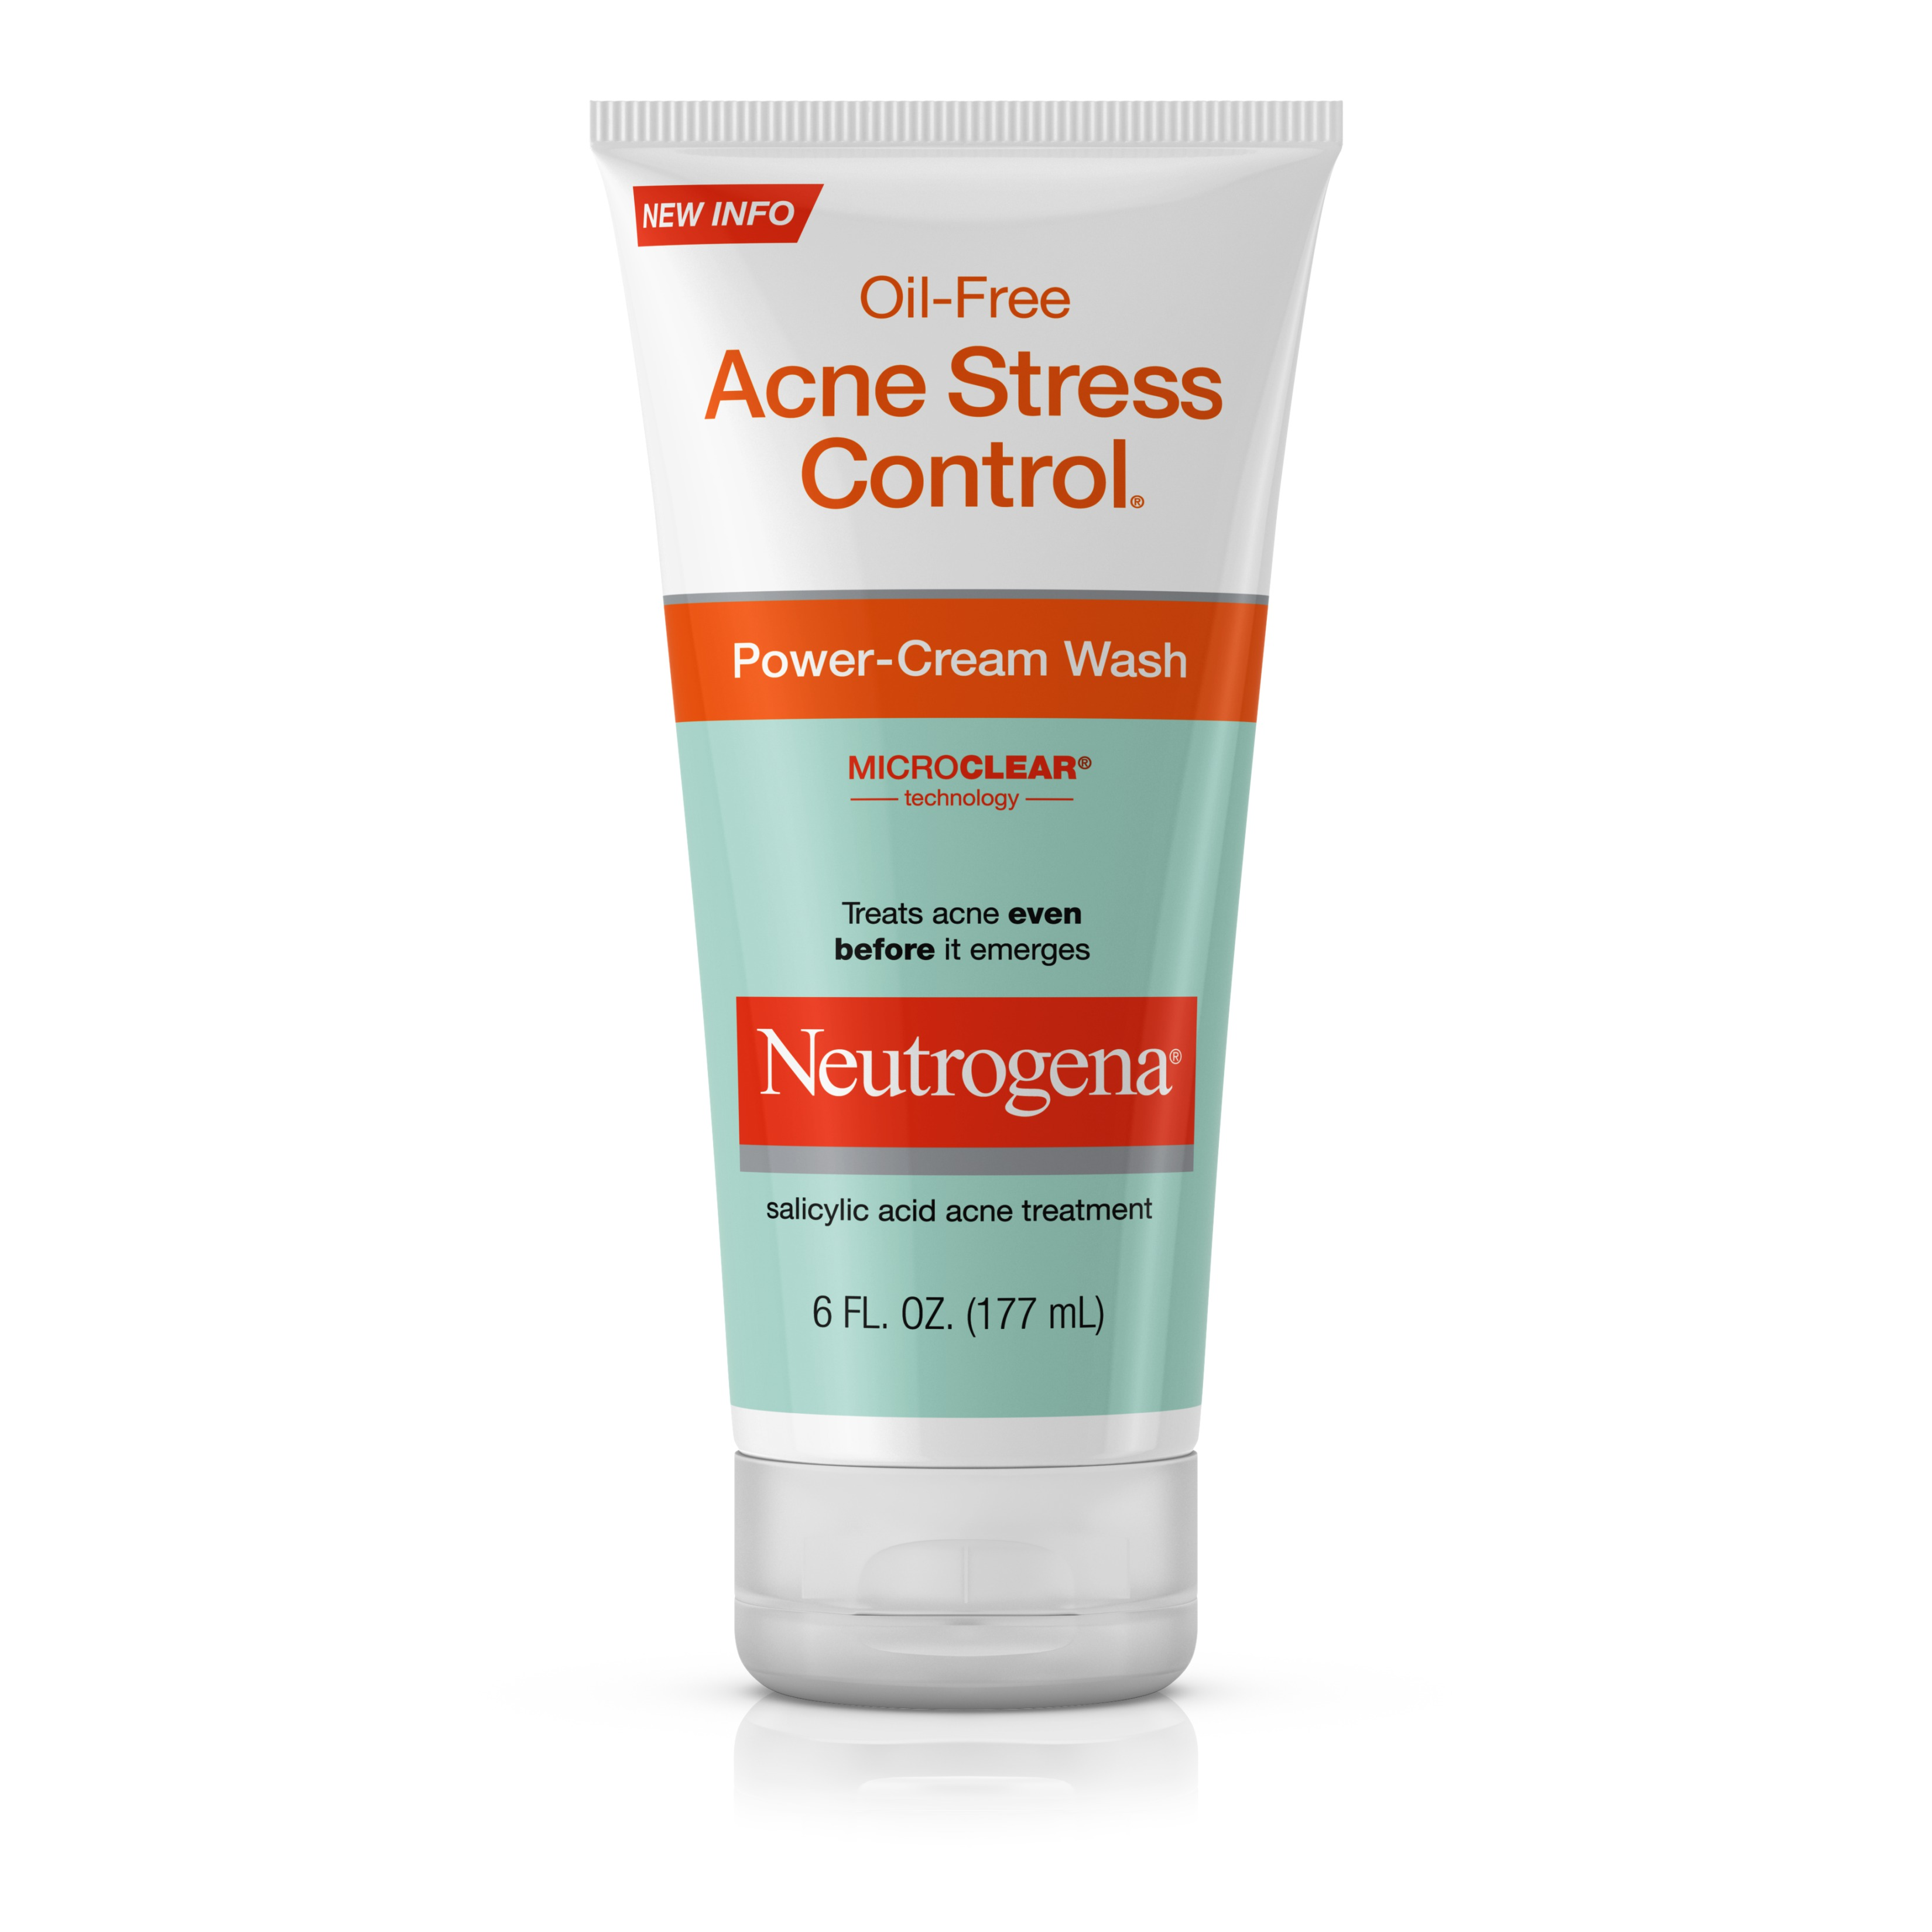 Neutrogena Oil-Free Acne Stress Control Power-Cream Wash, 6 Fl. Oz.